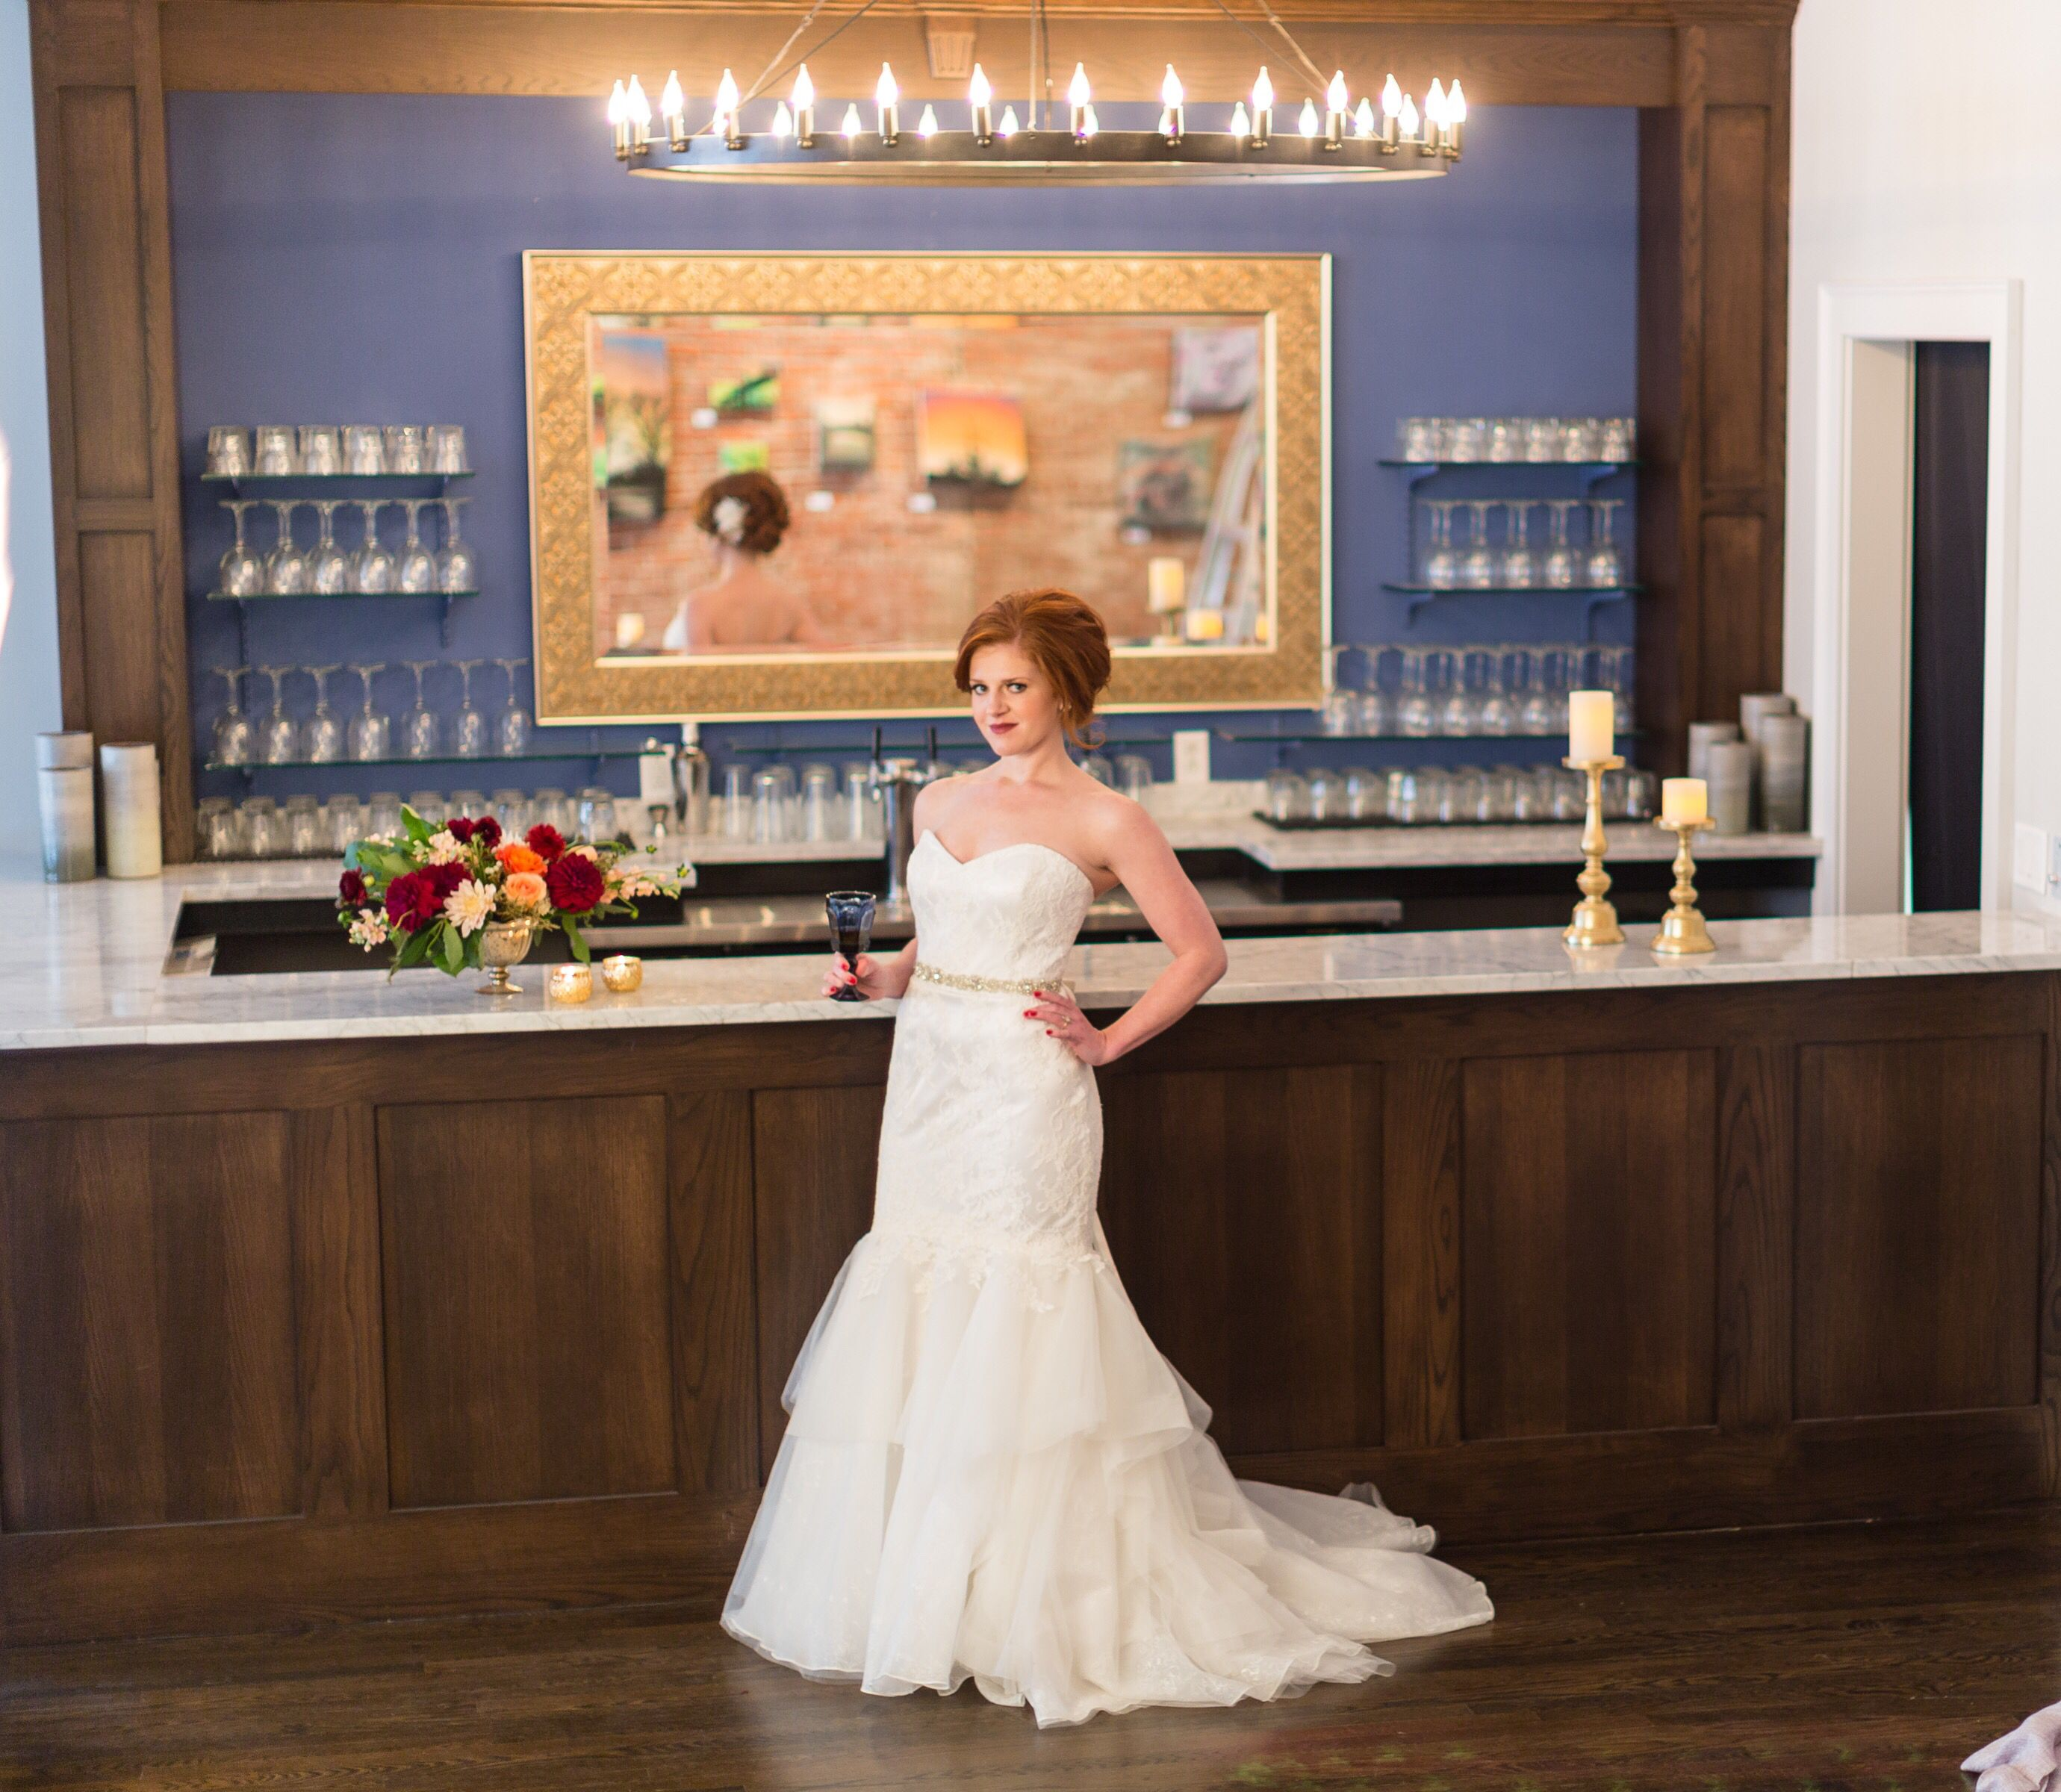 Beautiful bride & beautiful venue in downtown Kansas City